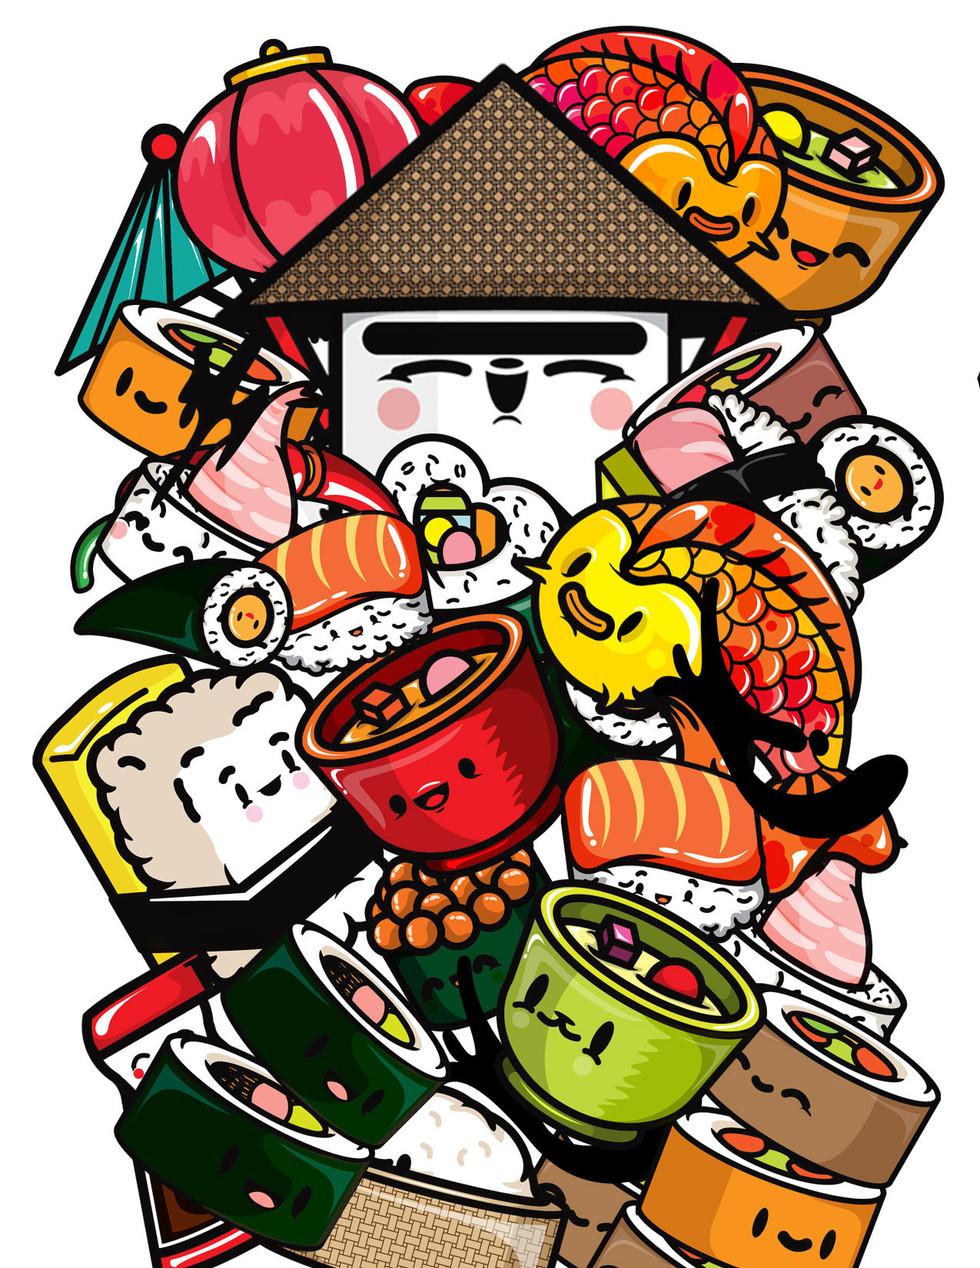 taka-sushi-mexico-chocotoy-5.jpg